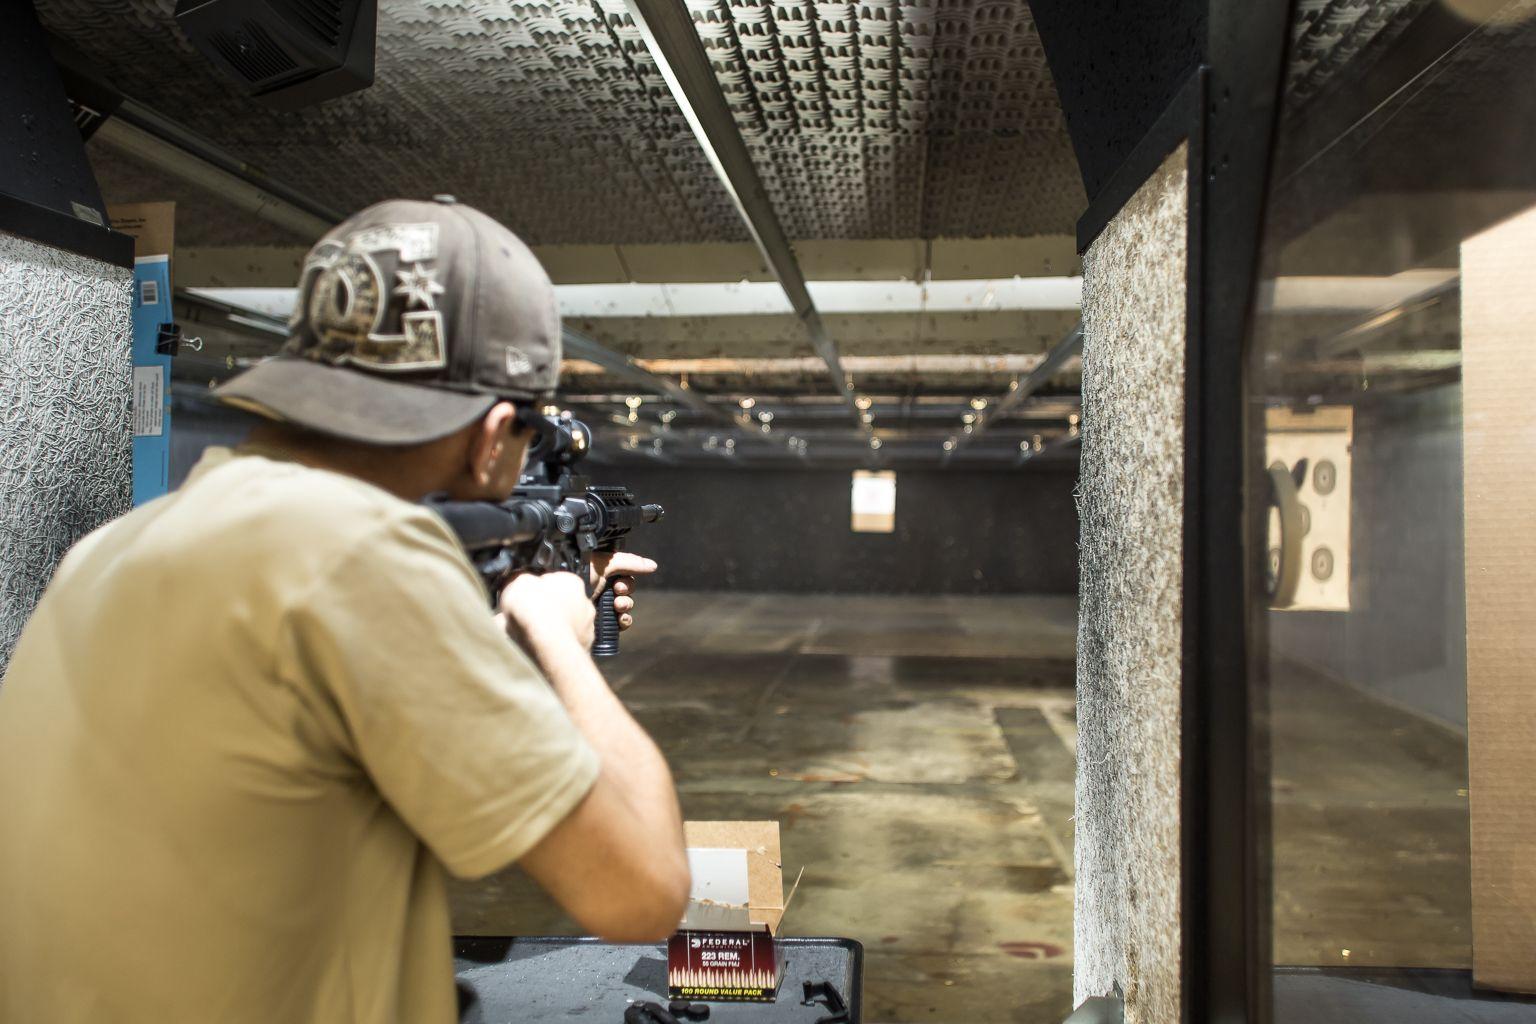 StateoftheArt Indoor Shooting Range in Denver for